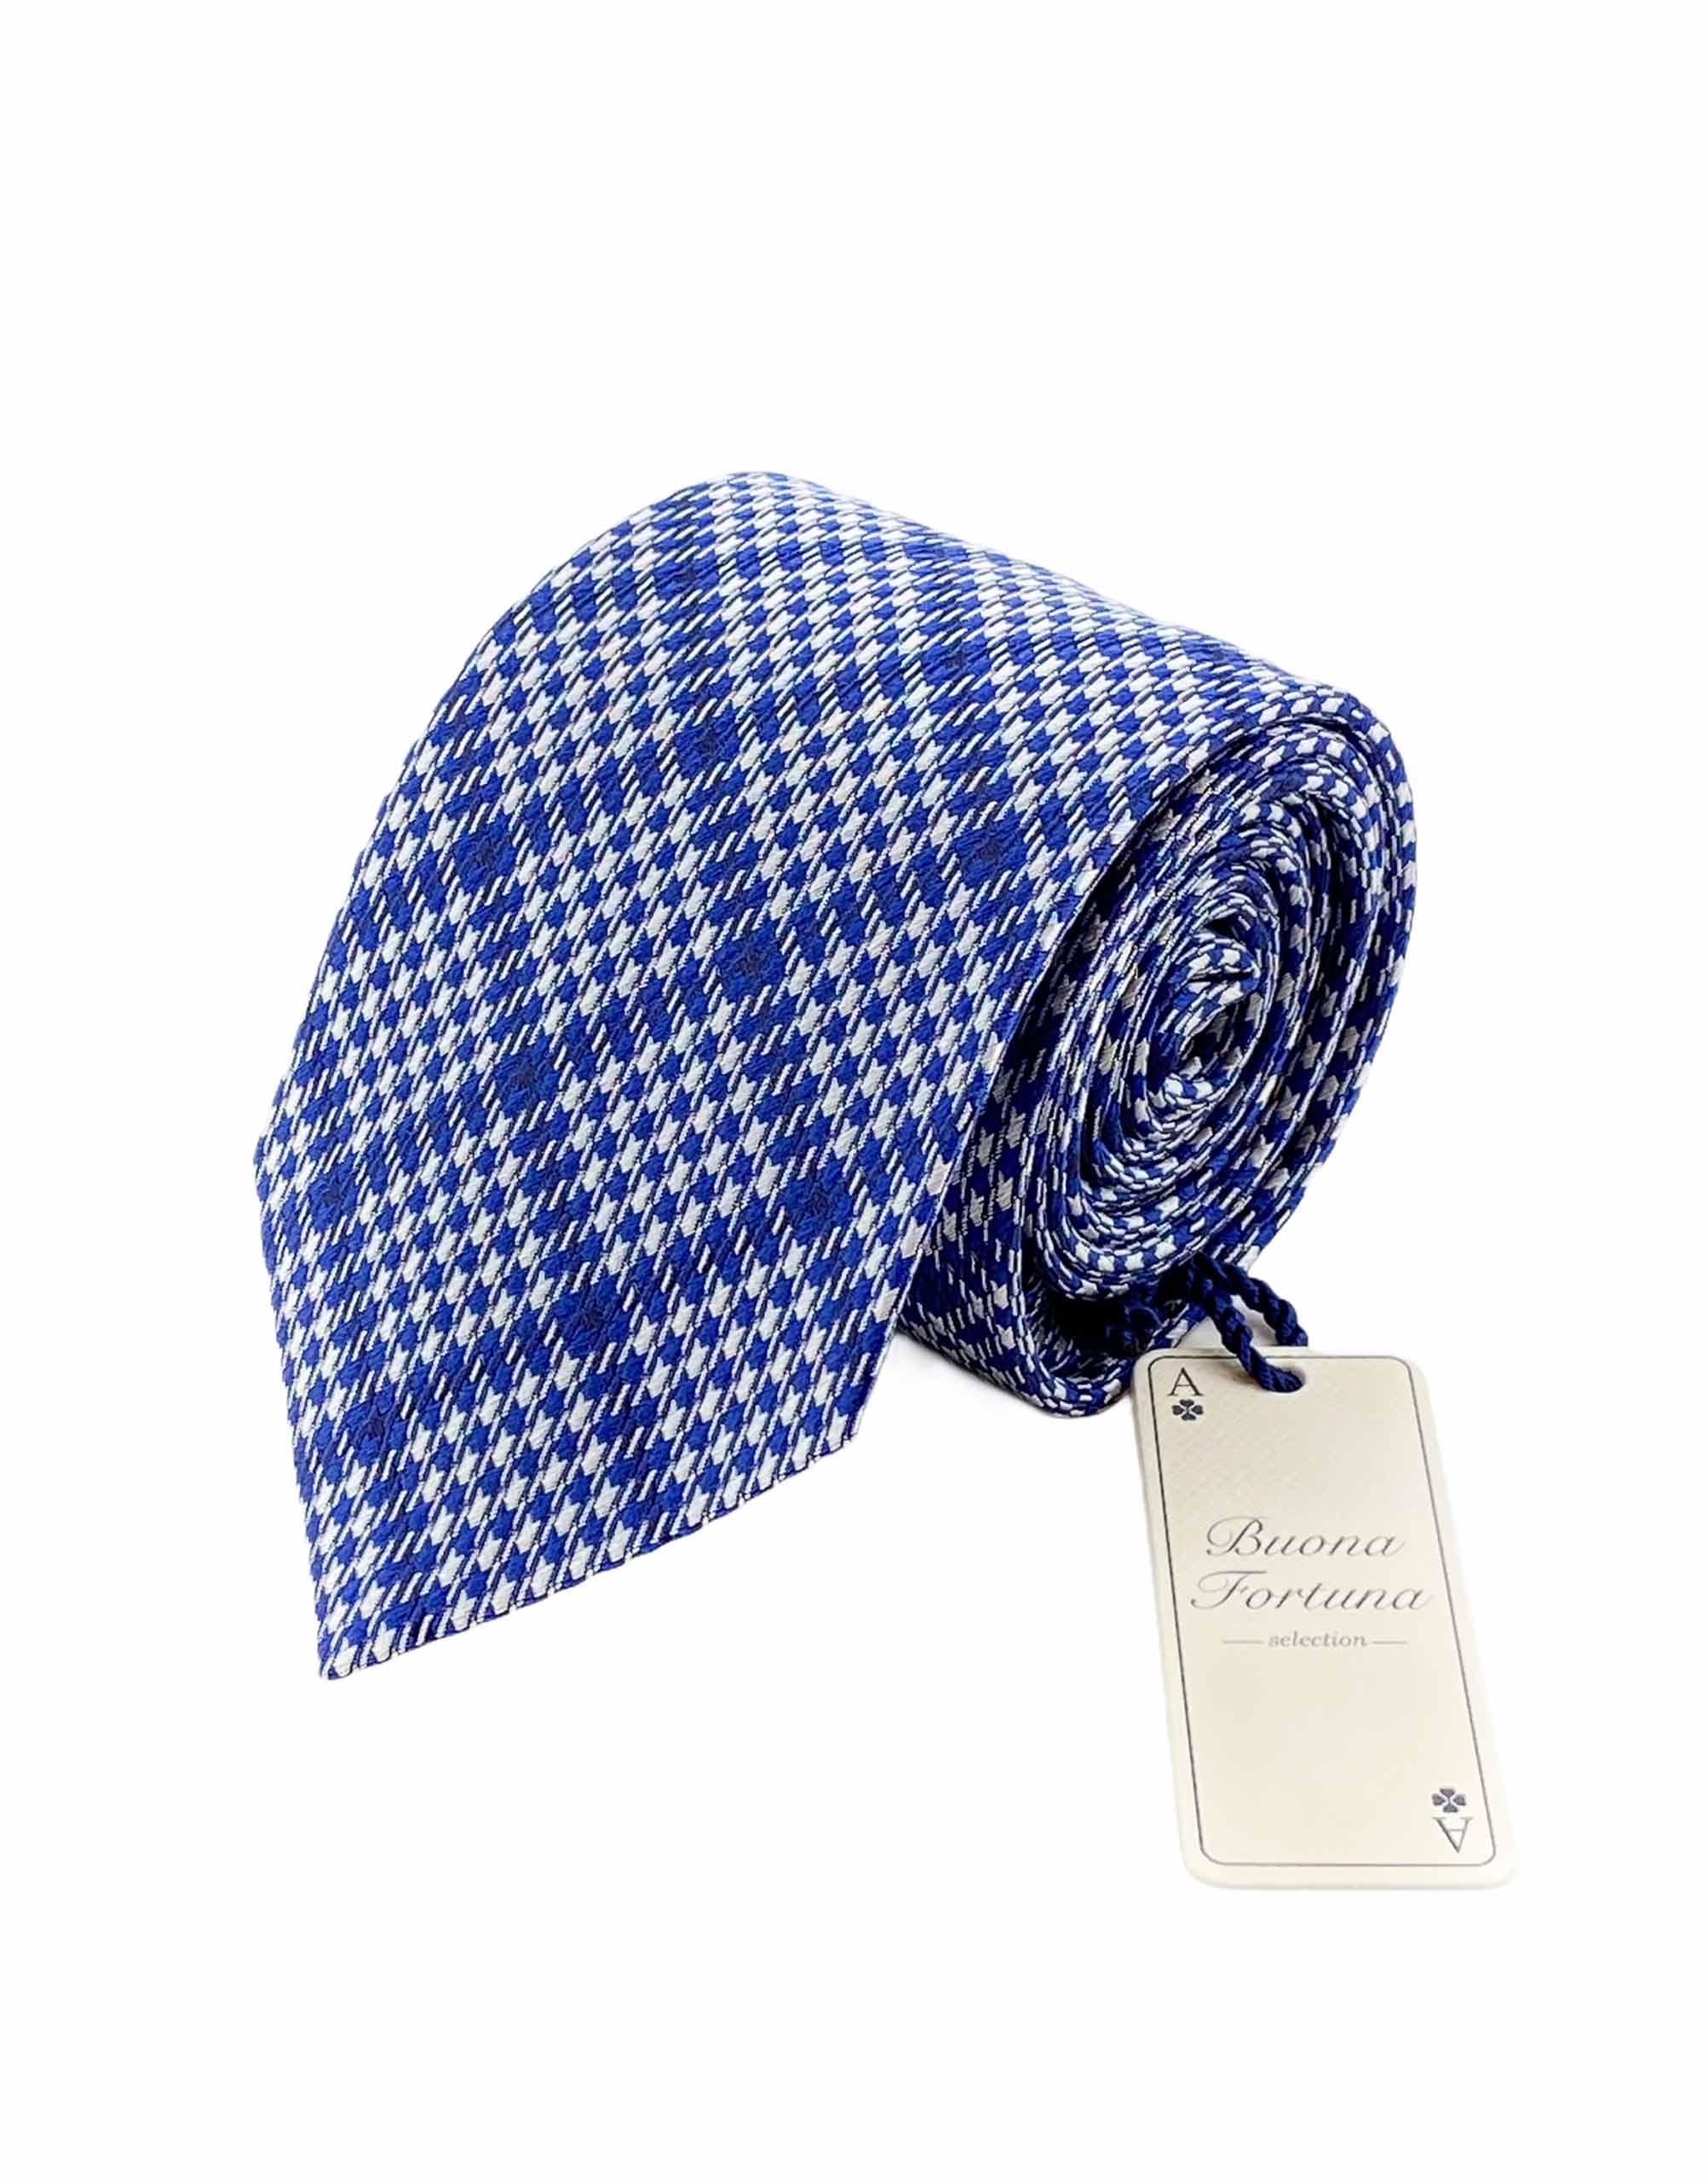 corbata tejida jacquard buona fortuna comprar online corbatas italianas exclusivas shop